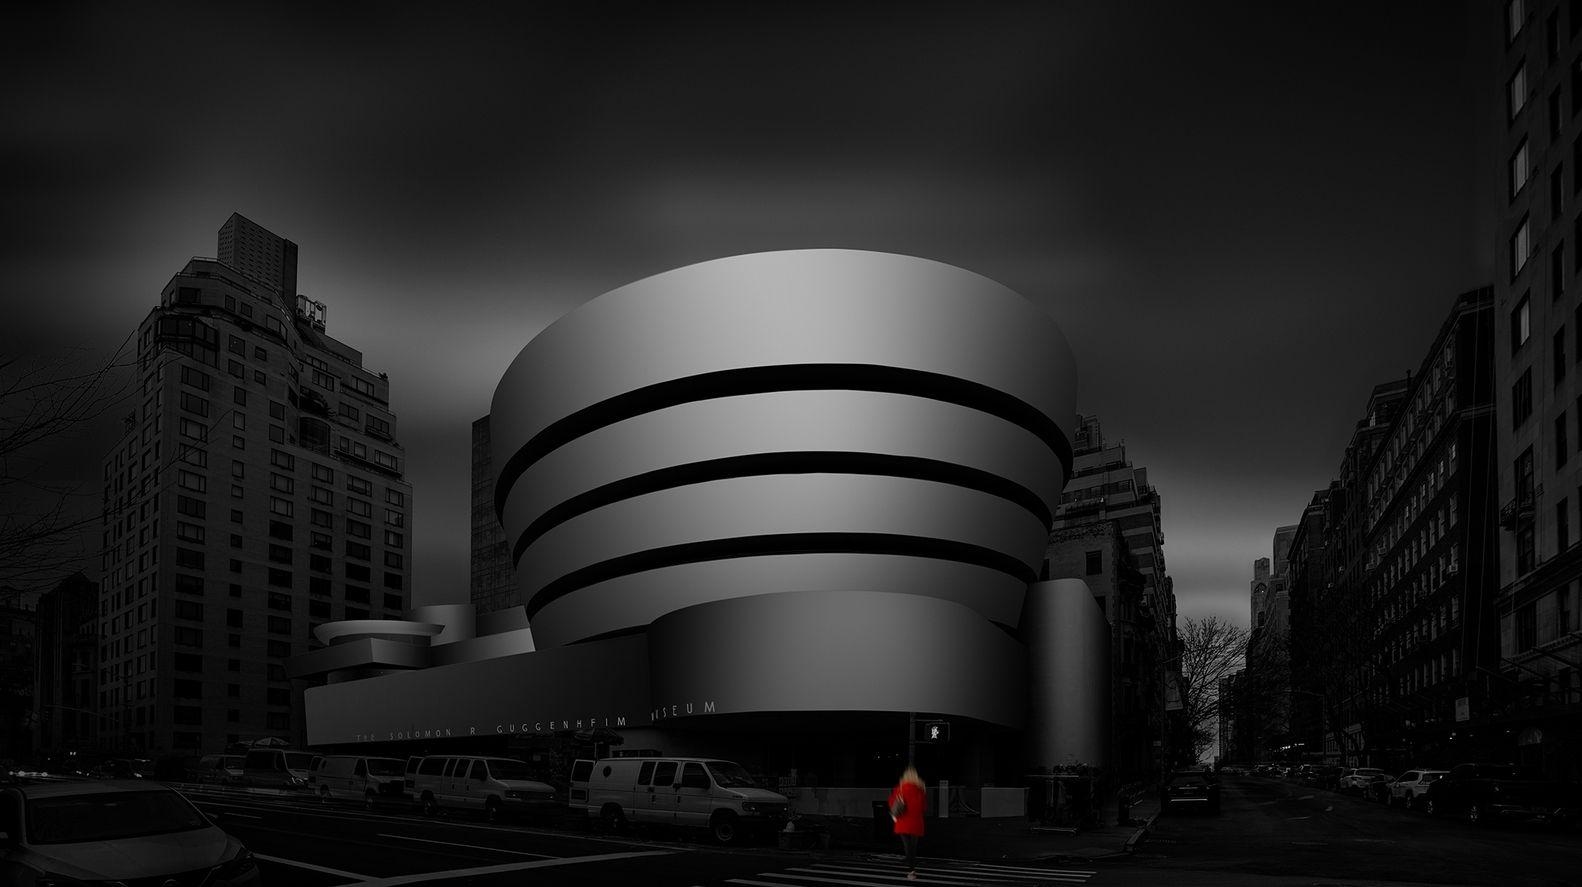 best award winning architecture photo new york by rbami yazagi